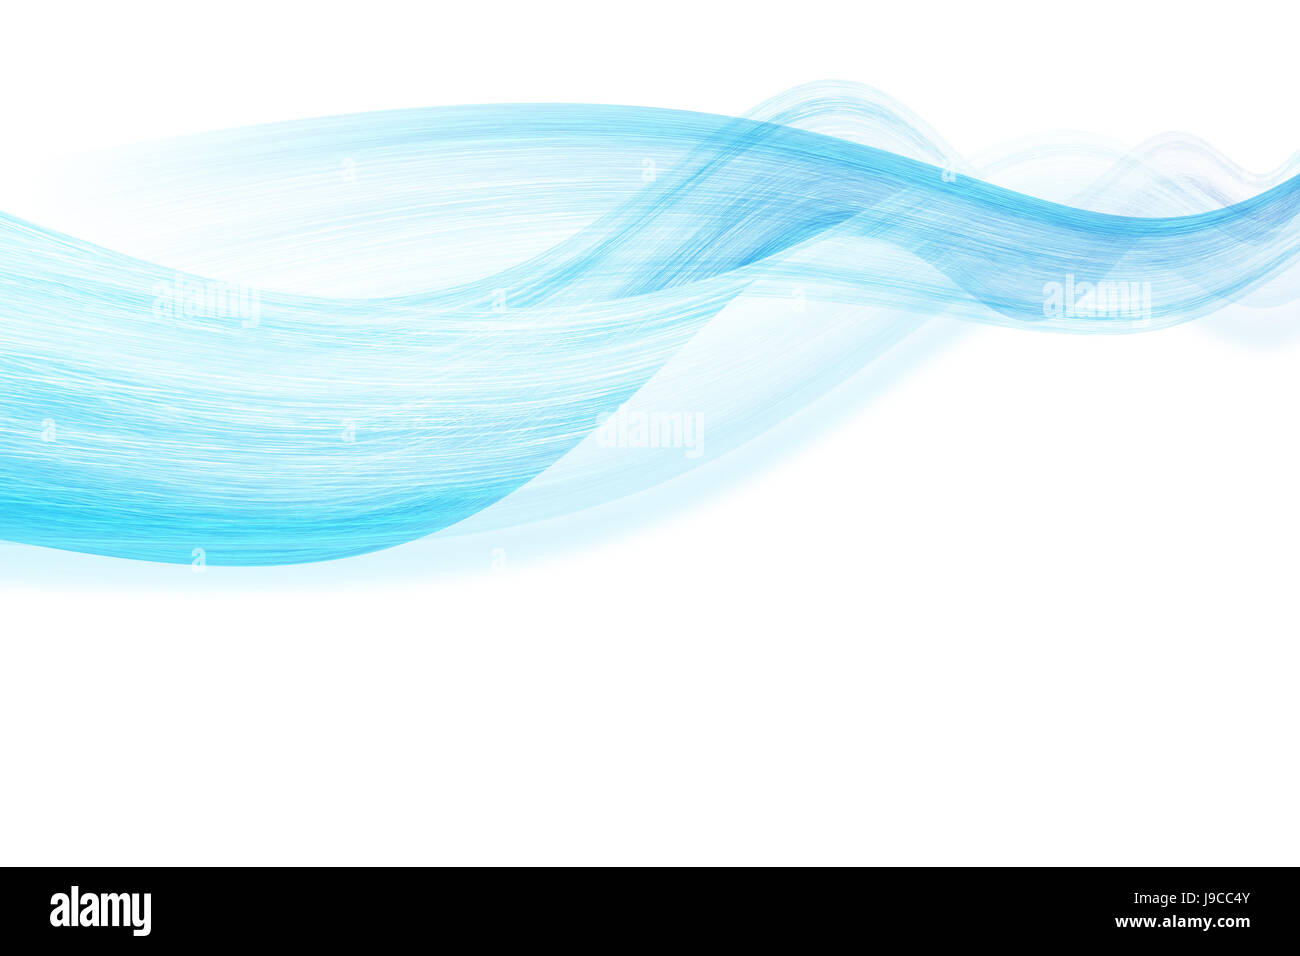 blue, waves, wallpaper, backdrop, background, white, wave, blue, motion, - Stock Image